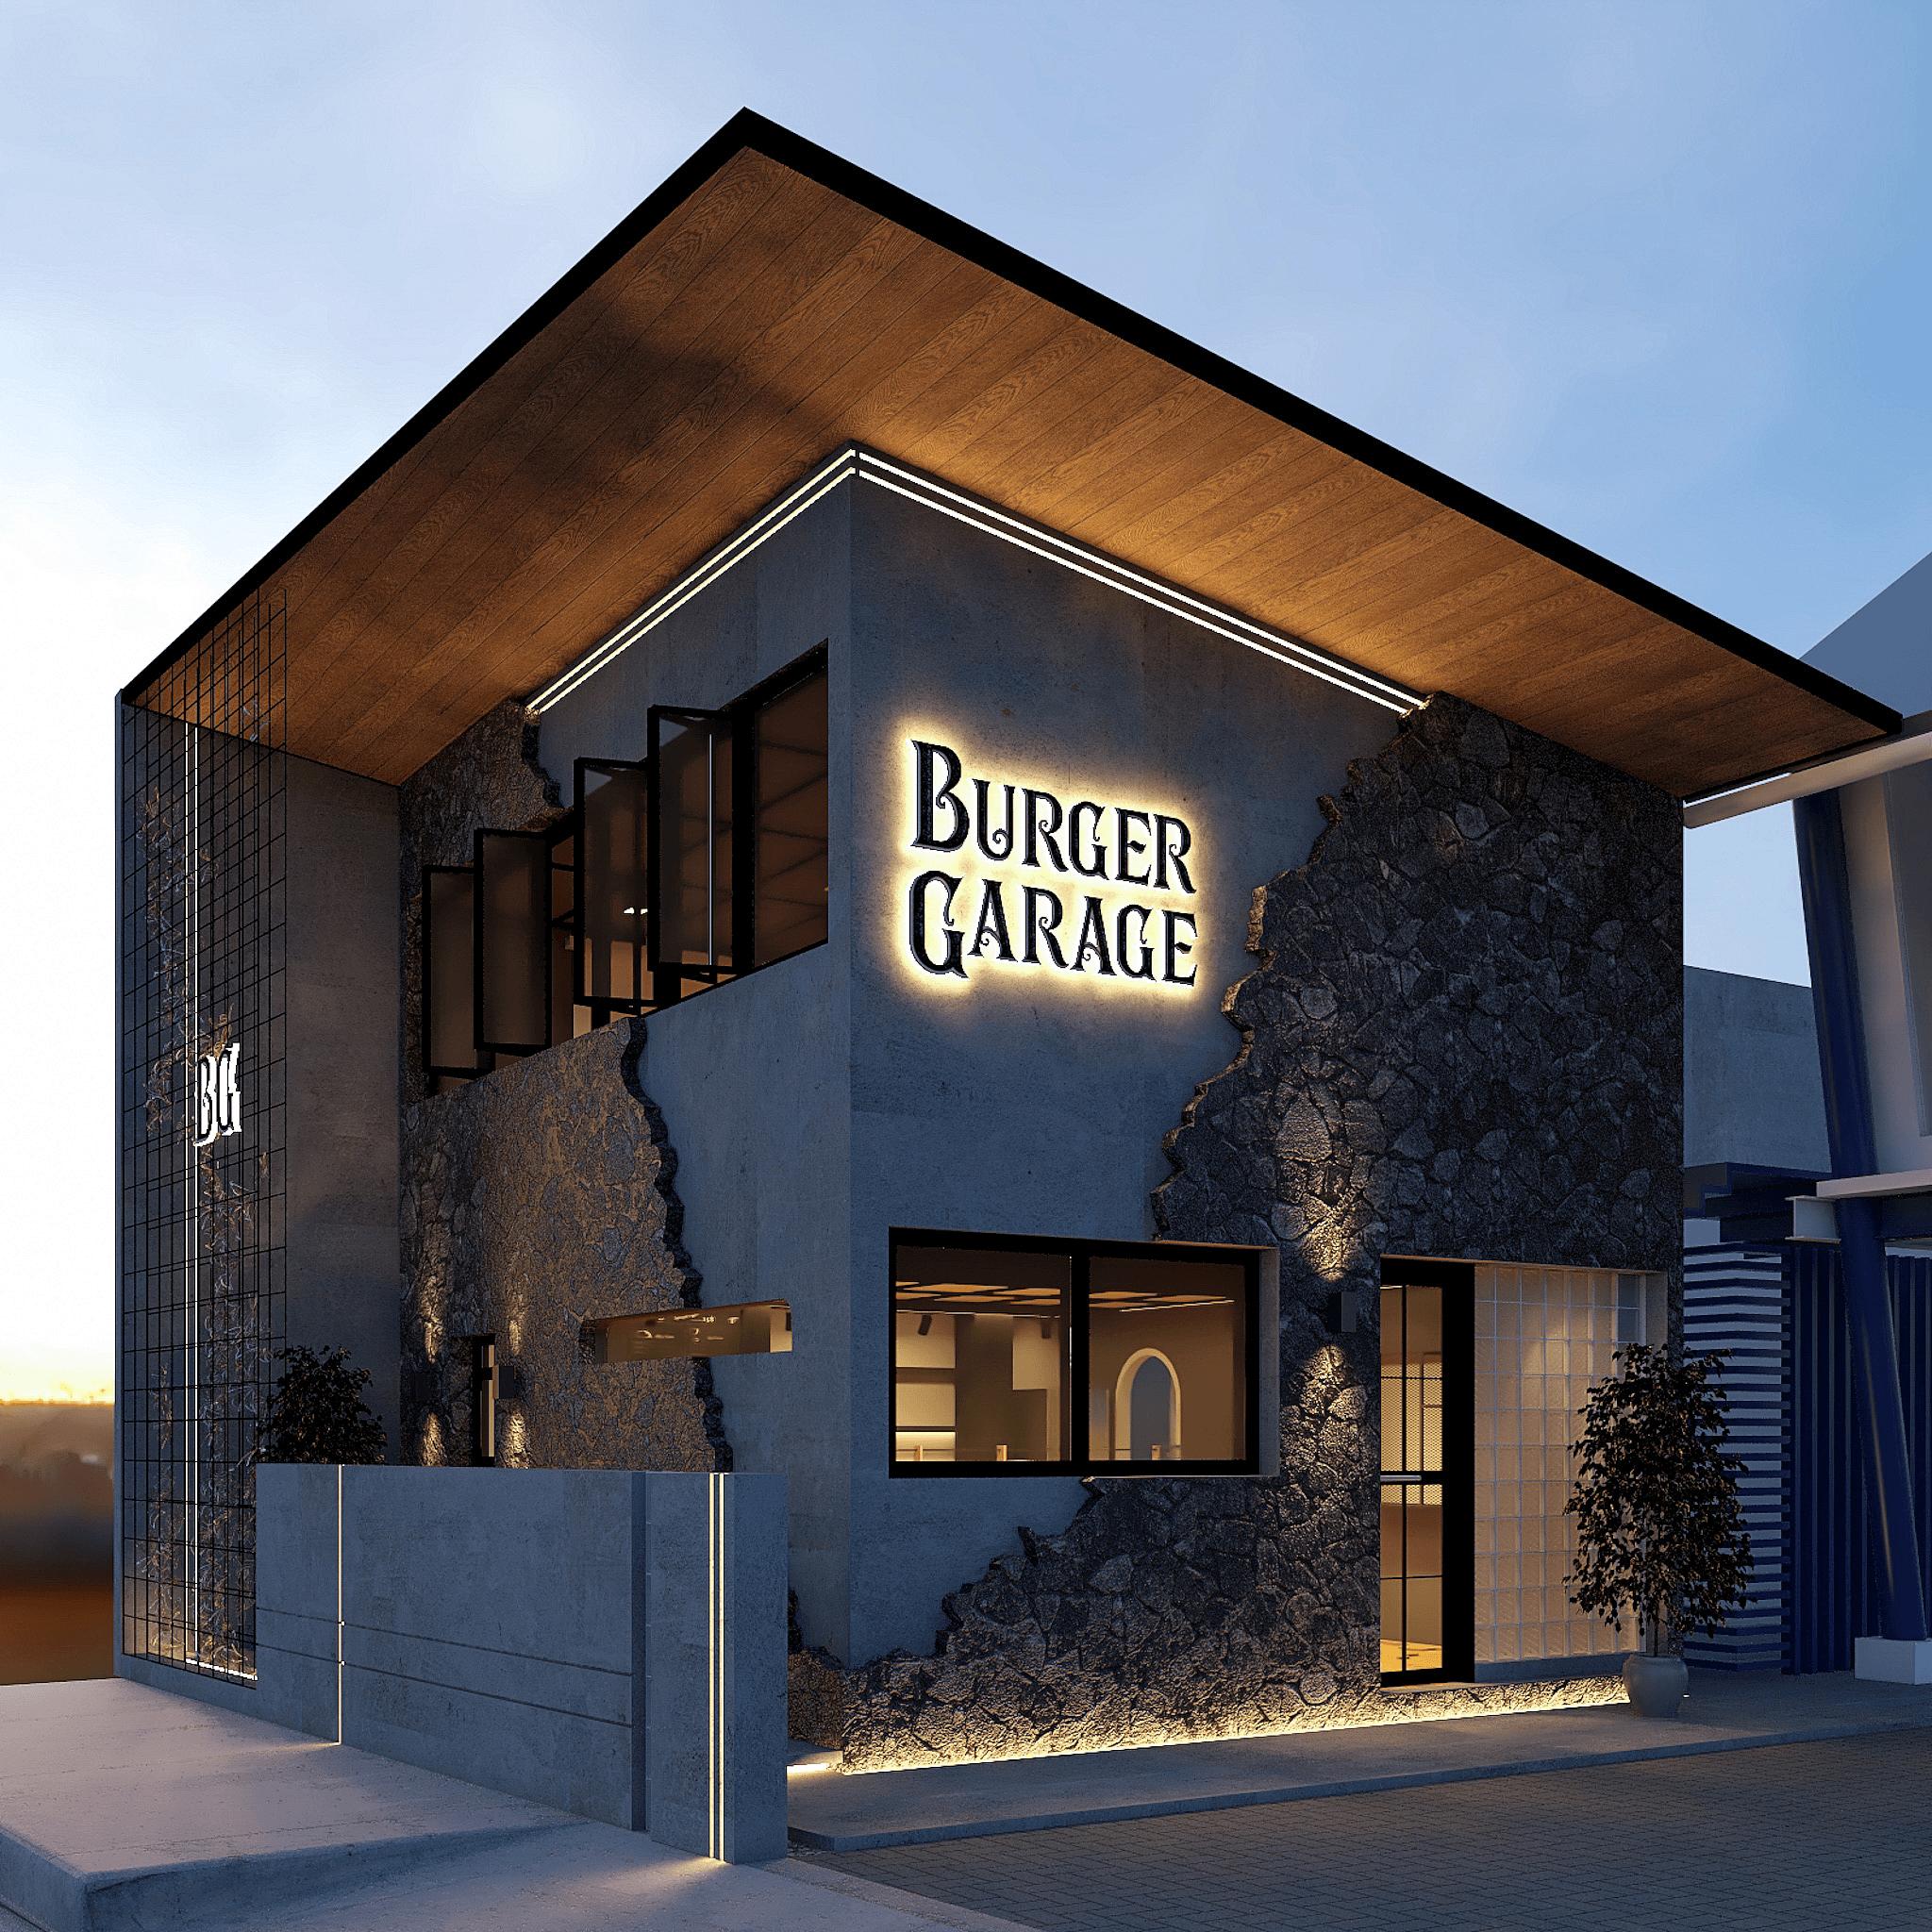 Sections Design & Architecture Premium Burger Restaurant Project (Cipete) Jl. Cipete Raya, Cipete Sel., Kec. Cilandak, Kota Jakarta Selatan, Daerah Khusus Ibukota Jakarta, Indonesia Jl. Cipete Raya, Cipete Sel., Kec. Cilandak, Kota Jakarta Selatan, Daerah Khusus Ibukota Jakarta, Indonesia Sections-Design-Architecture-Premium-Burger-Restaurant-Project-Cipete  123193